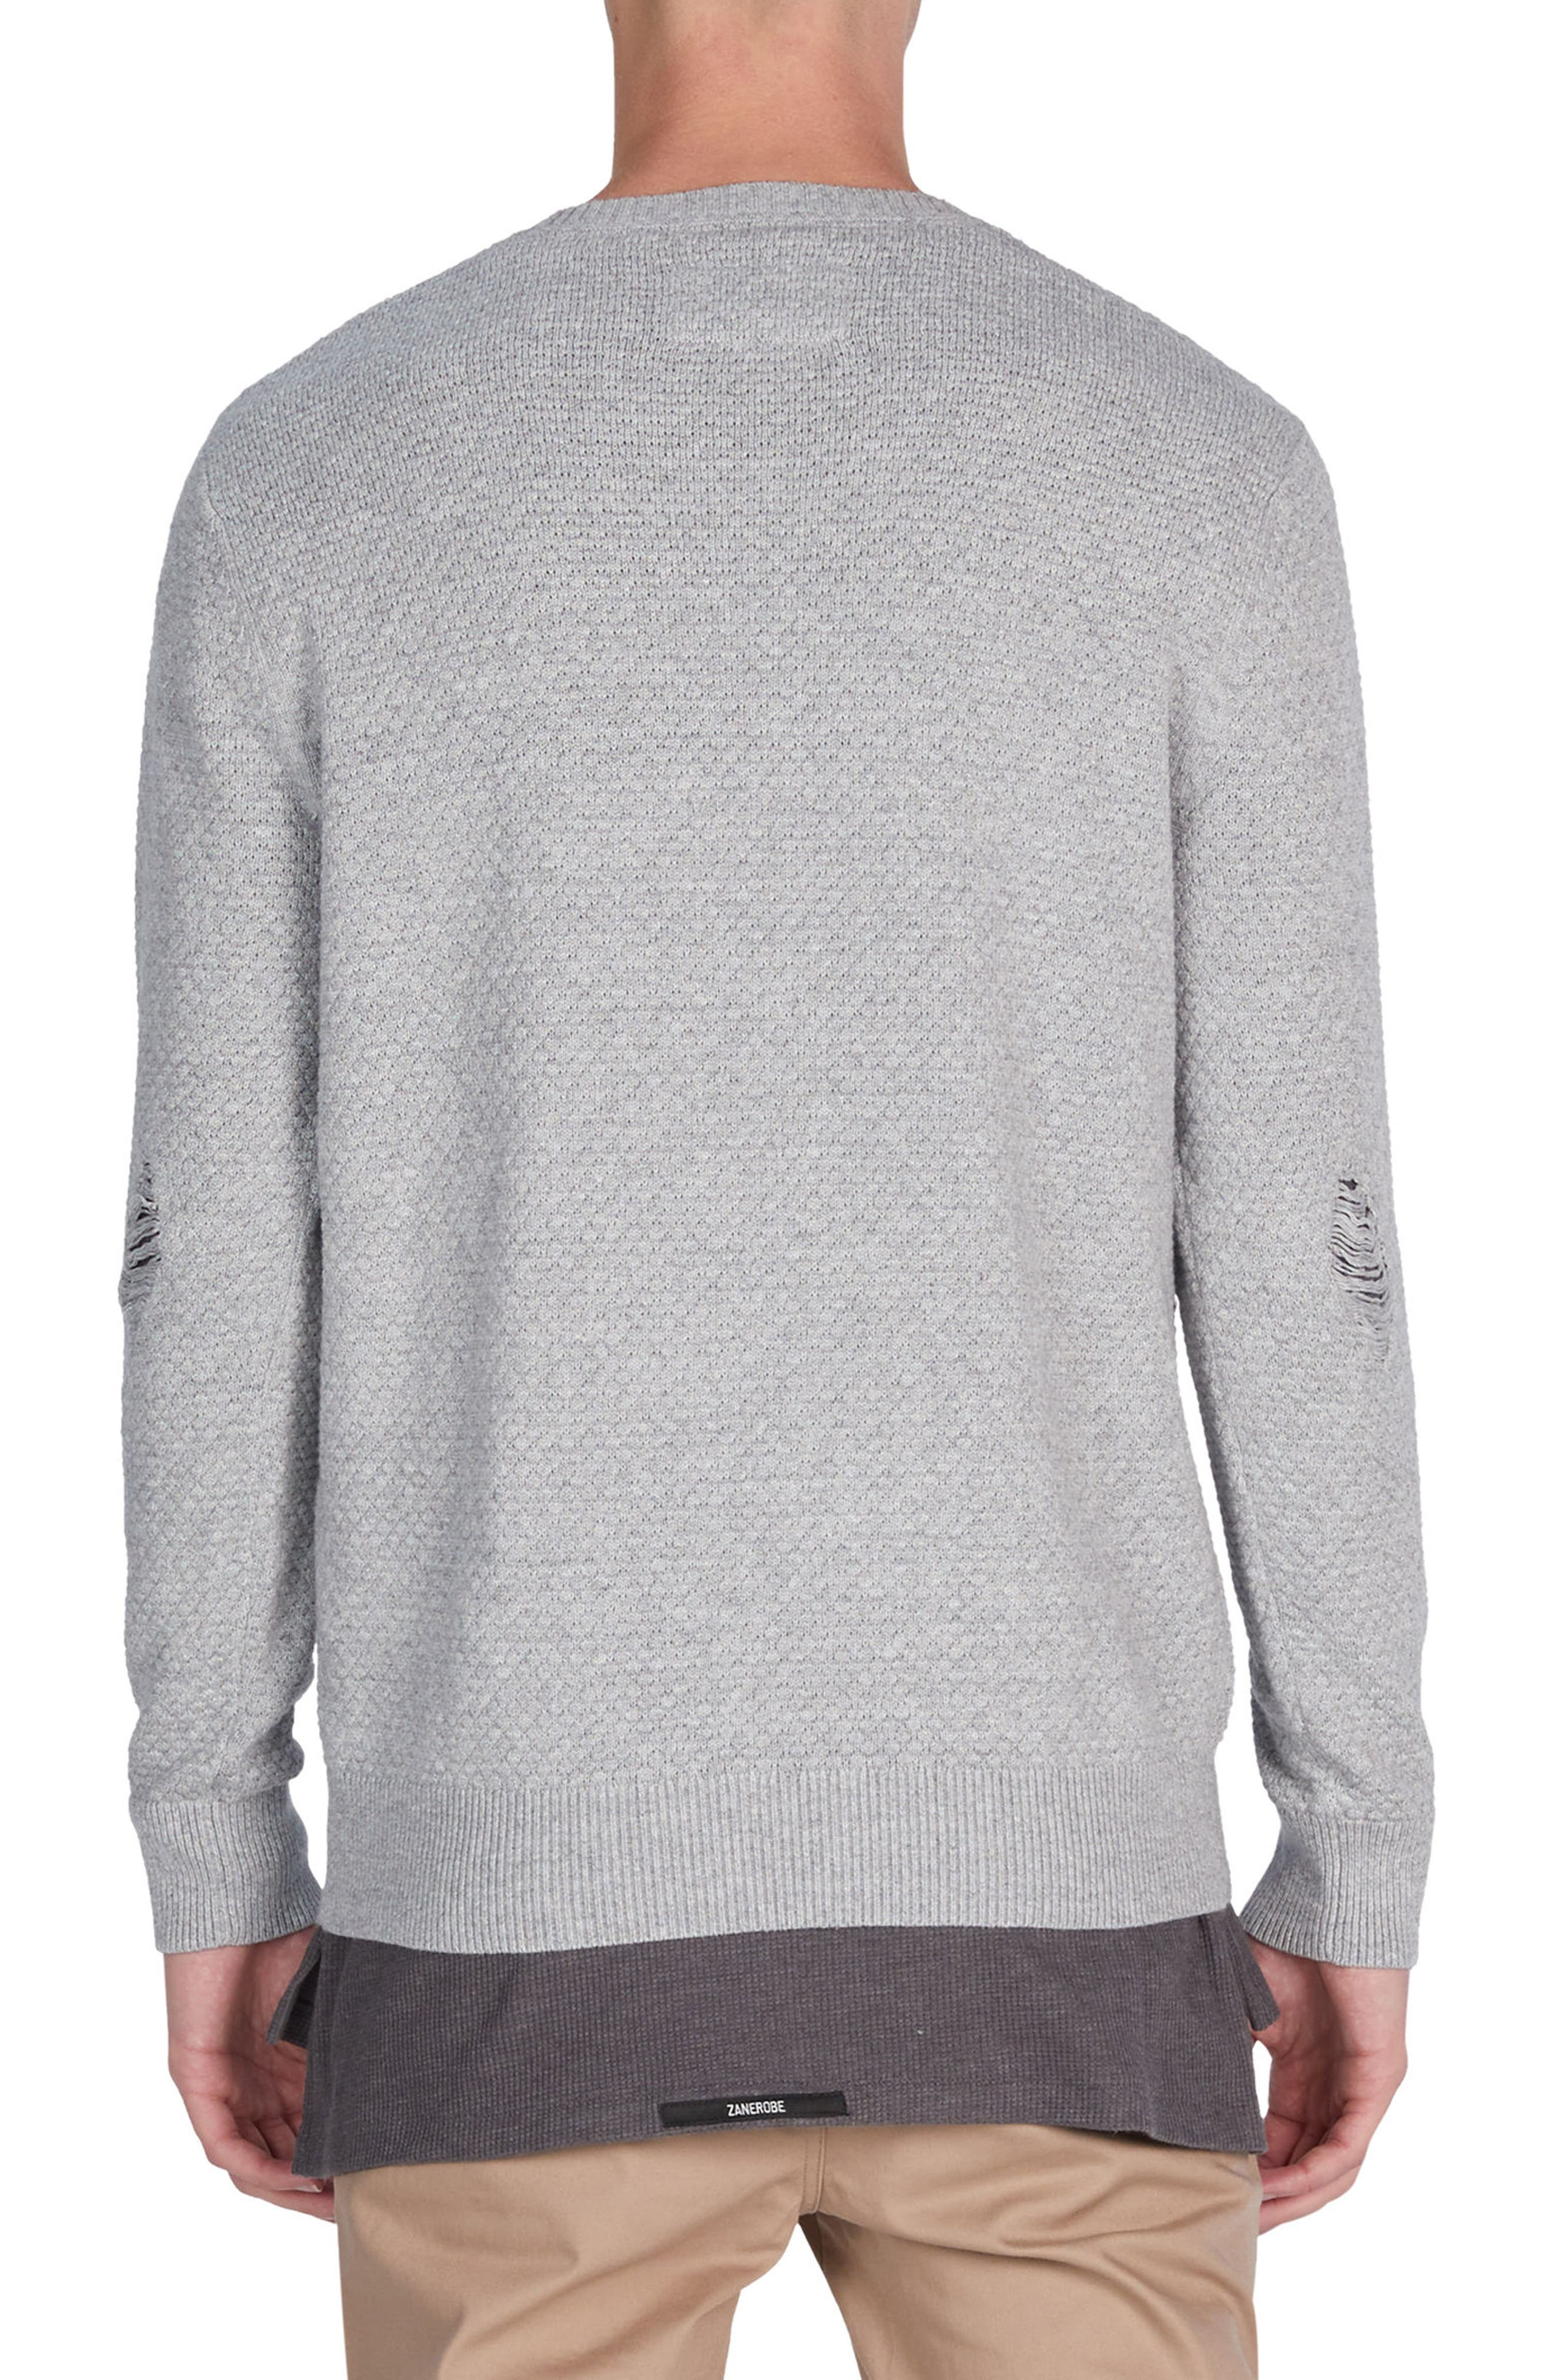 Grip Crewneck Sweater,                             Alternate thumbnail 2, color,                             030